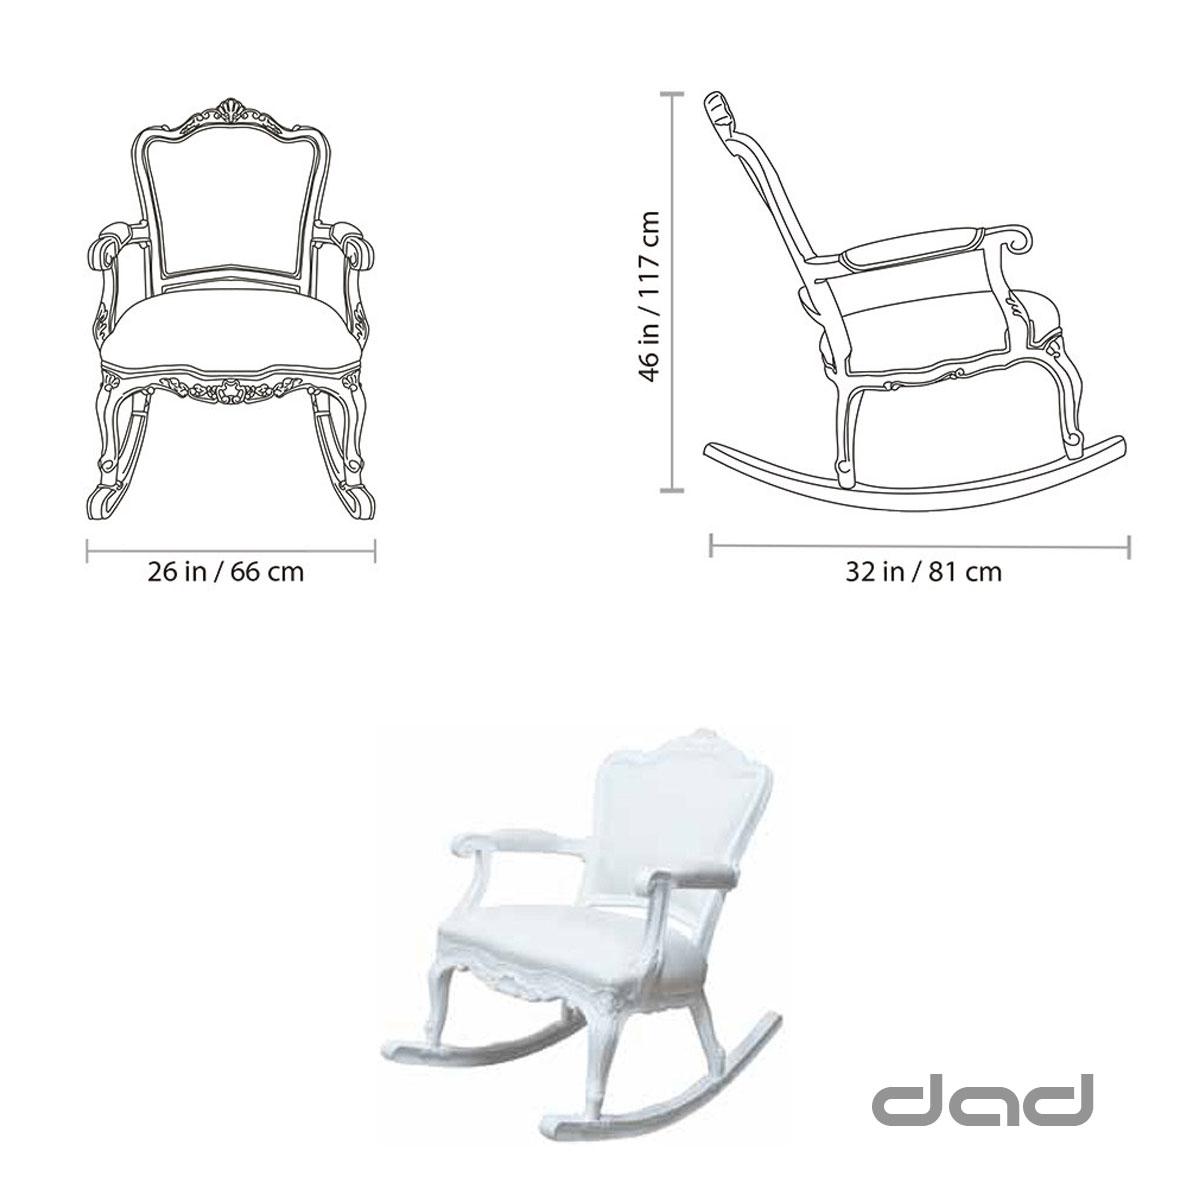 Dad rocking chair dimensions